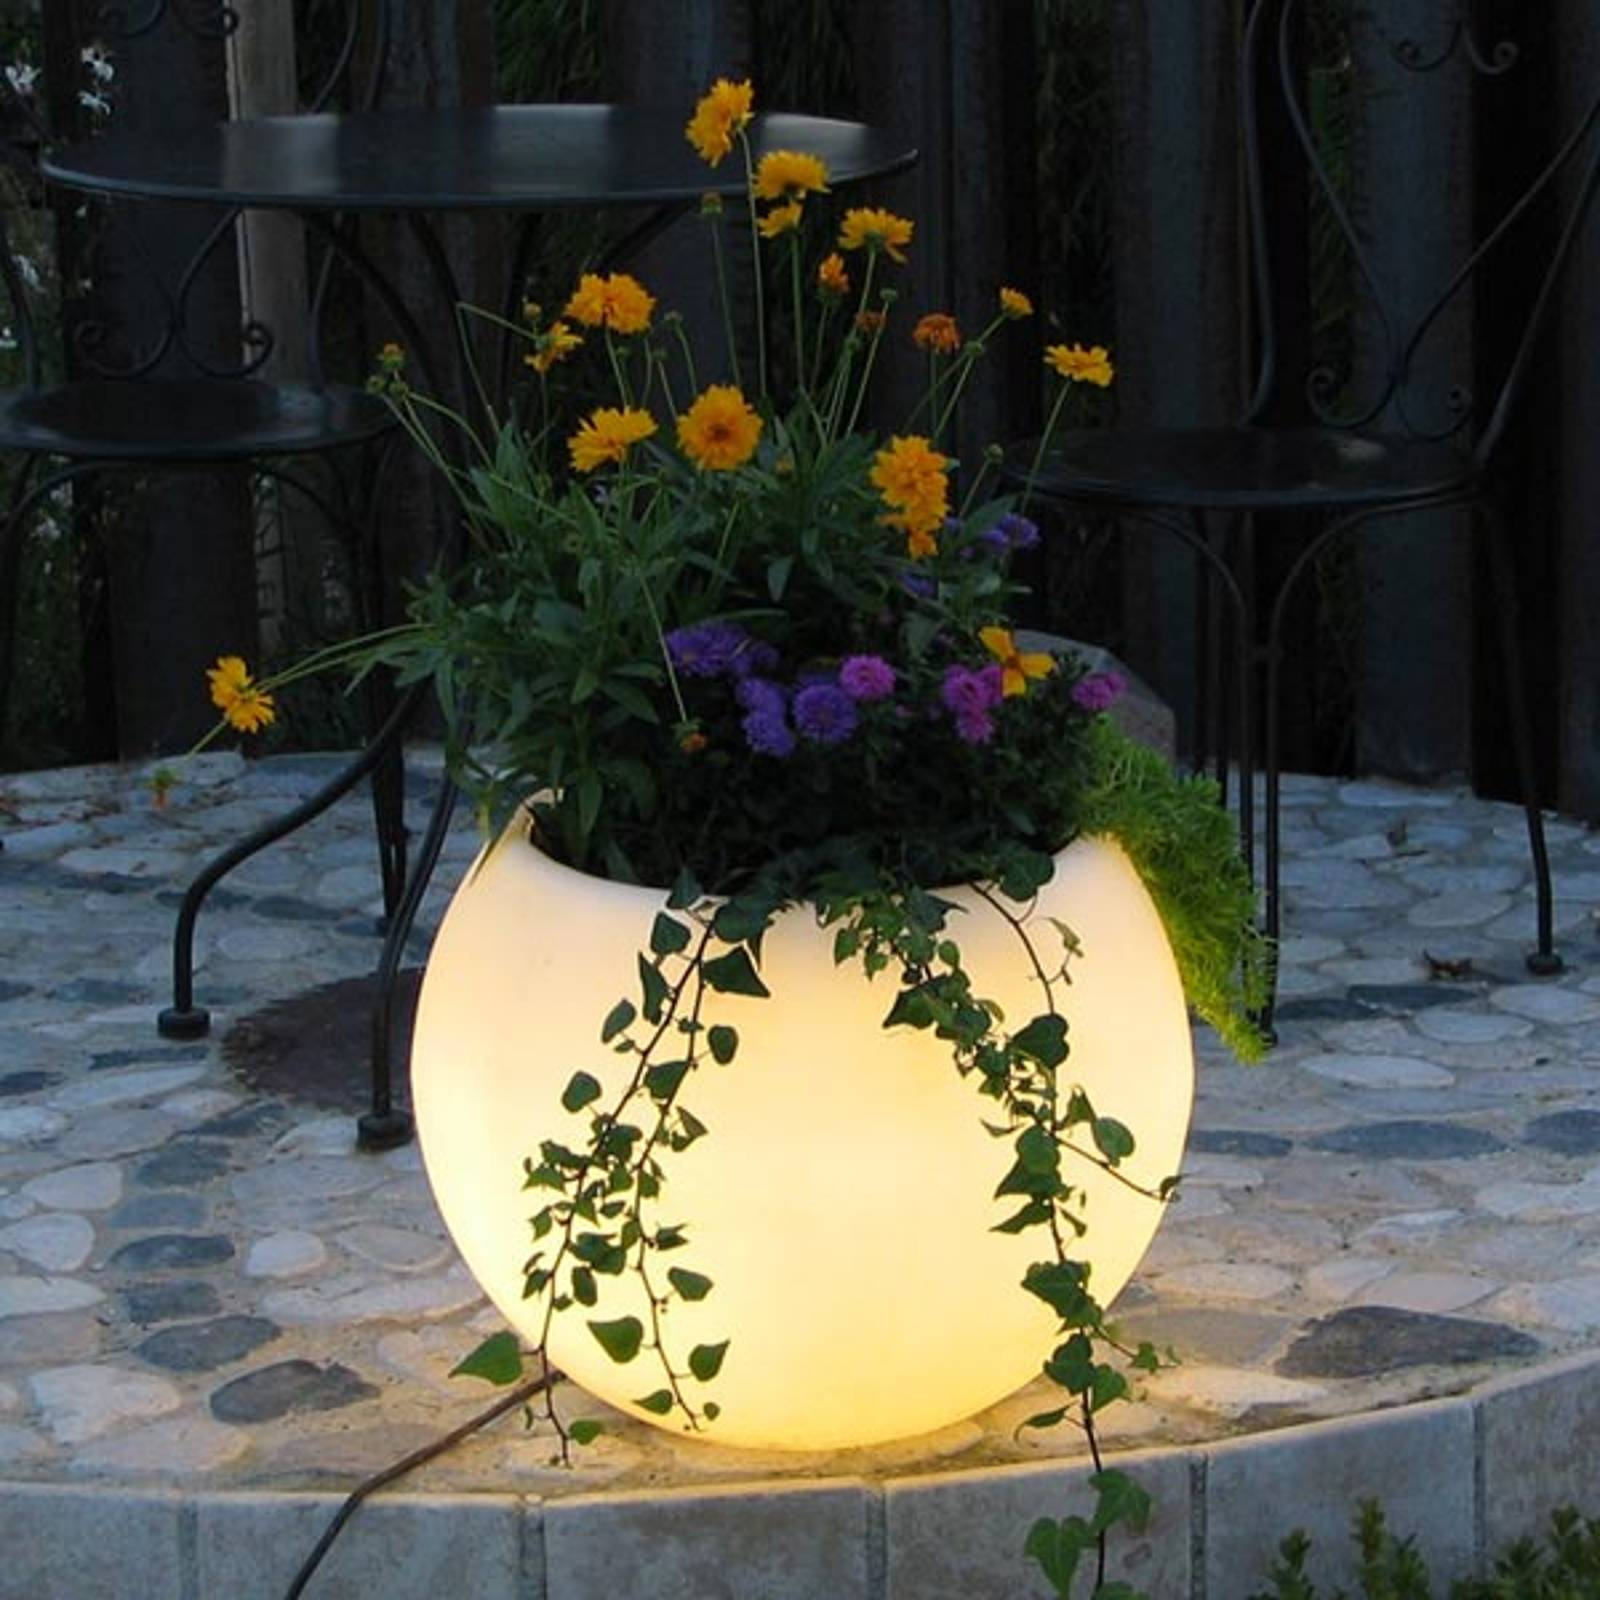 LED-kukka-astia Flora, akku, 50 cm valkoiset LEDit